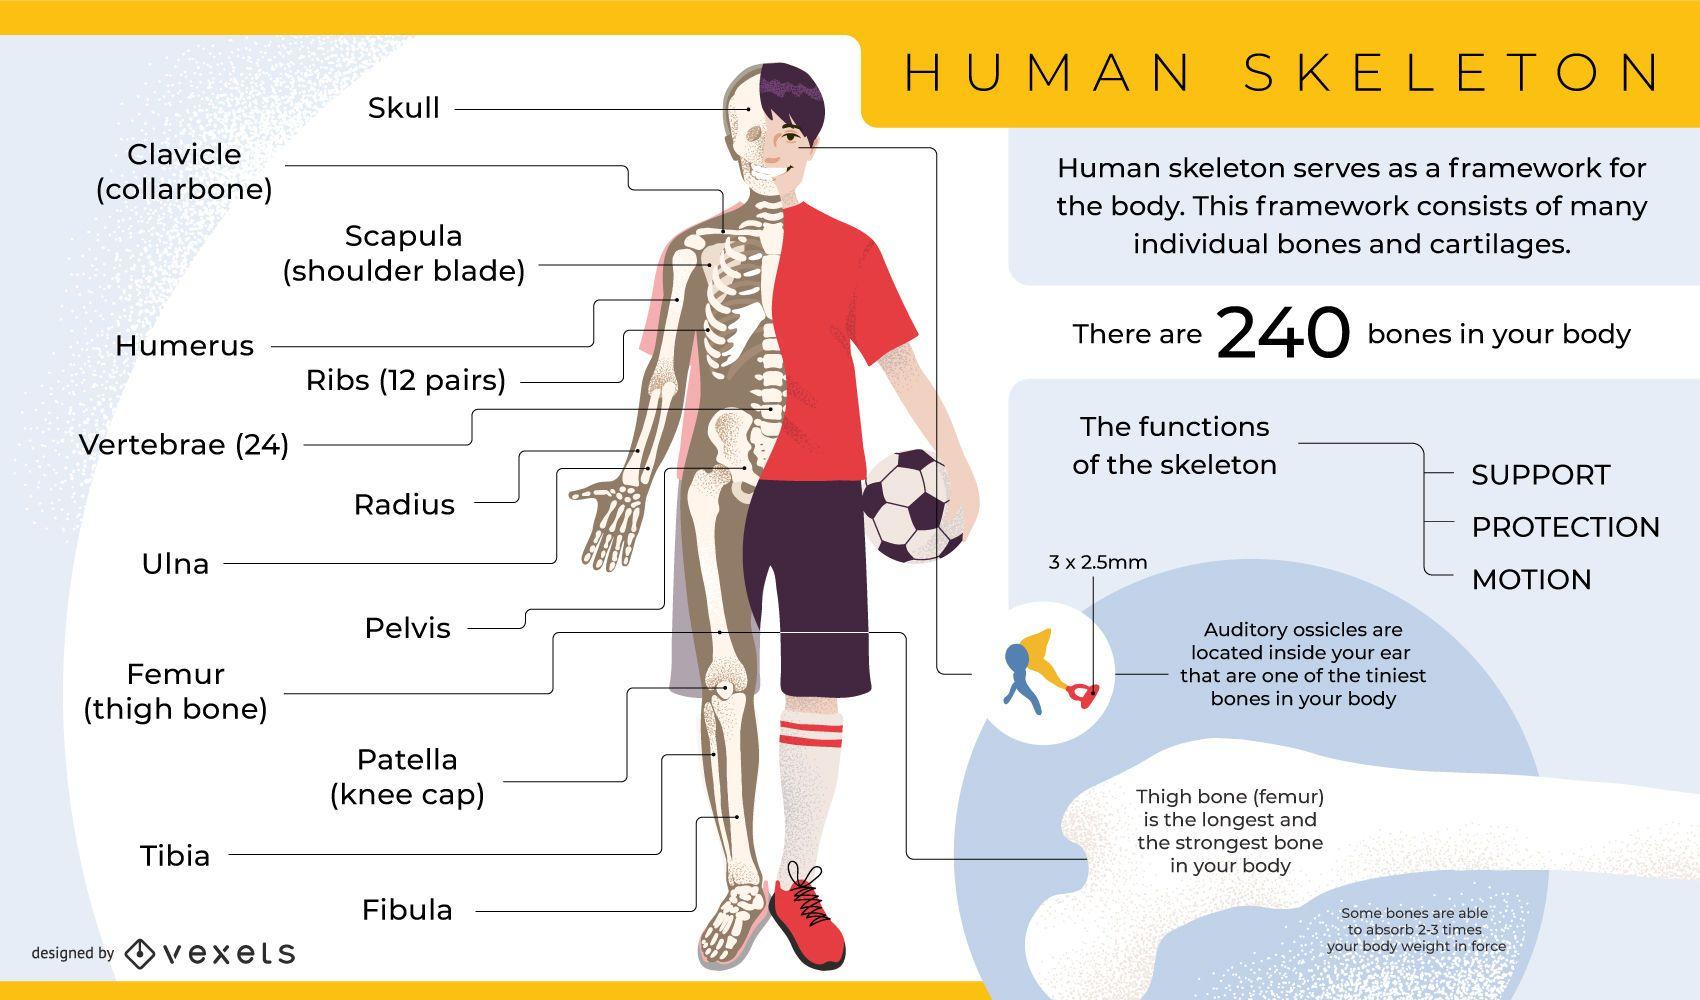 Plantilla de infograf?a de esqueleto humano